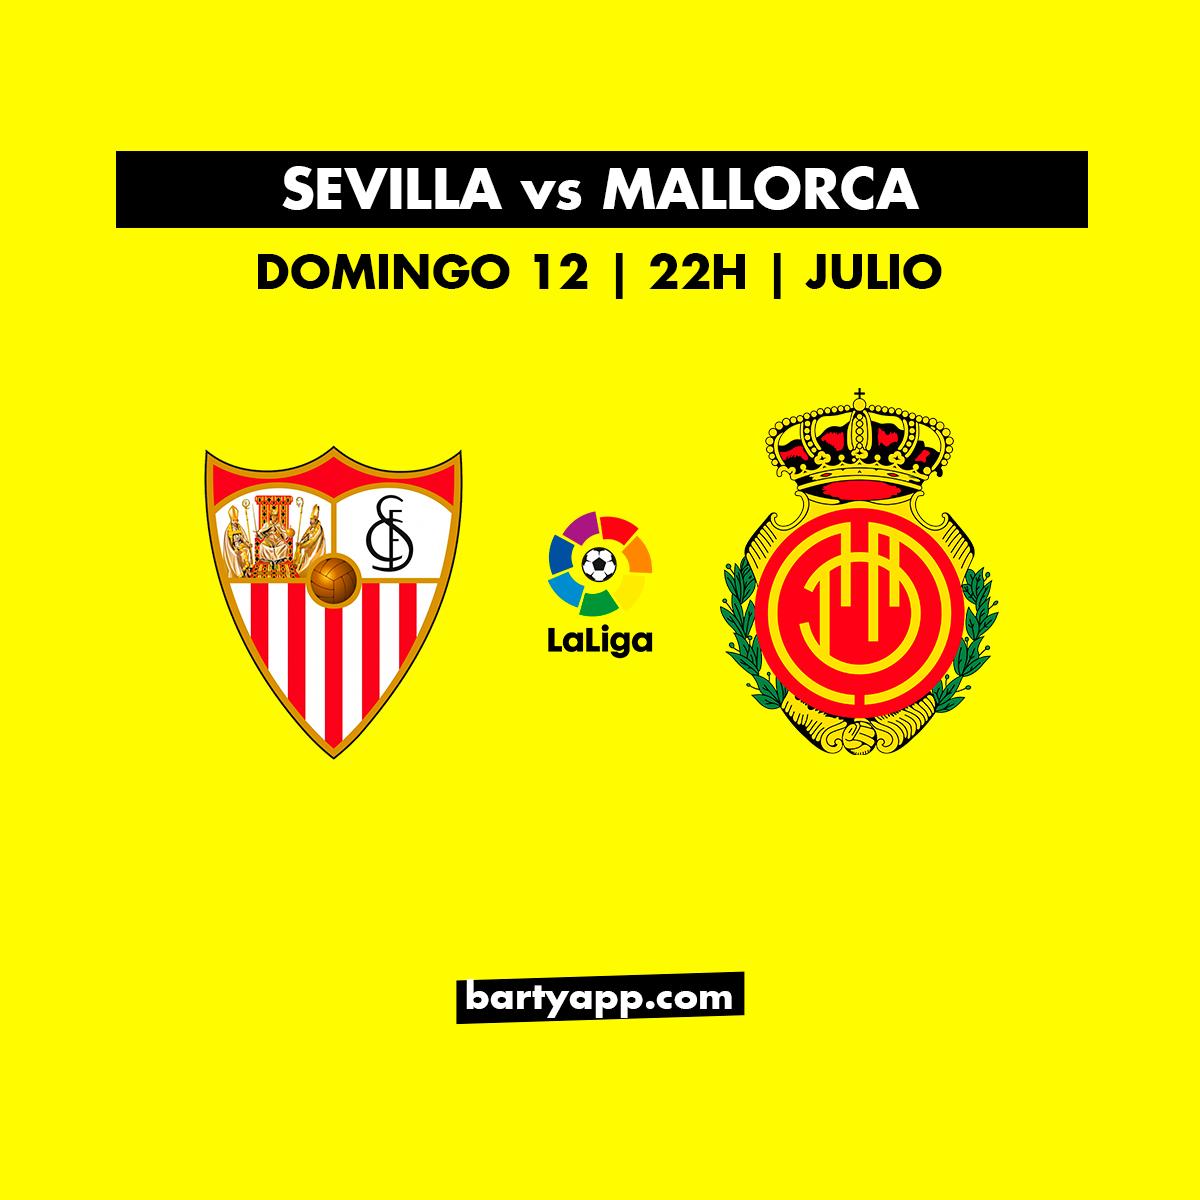 Los partidos de tu equipo en tu bar. 👀☘👌 #laliga #domingo #sevilla #betis #futbol #sportsbar #bares https://t.co/IKH38iFw6G